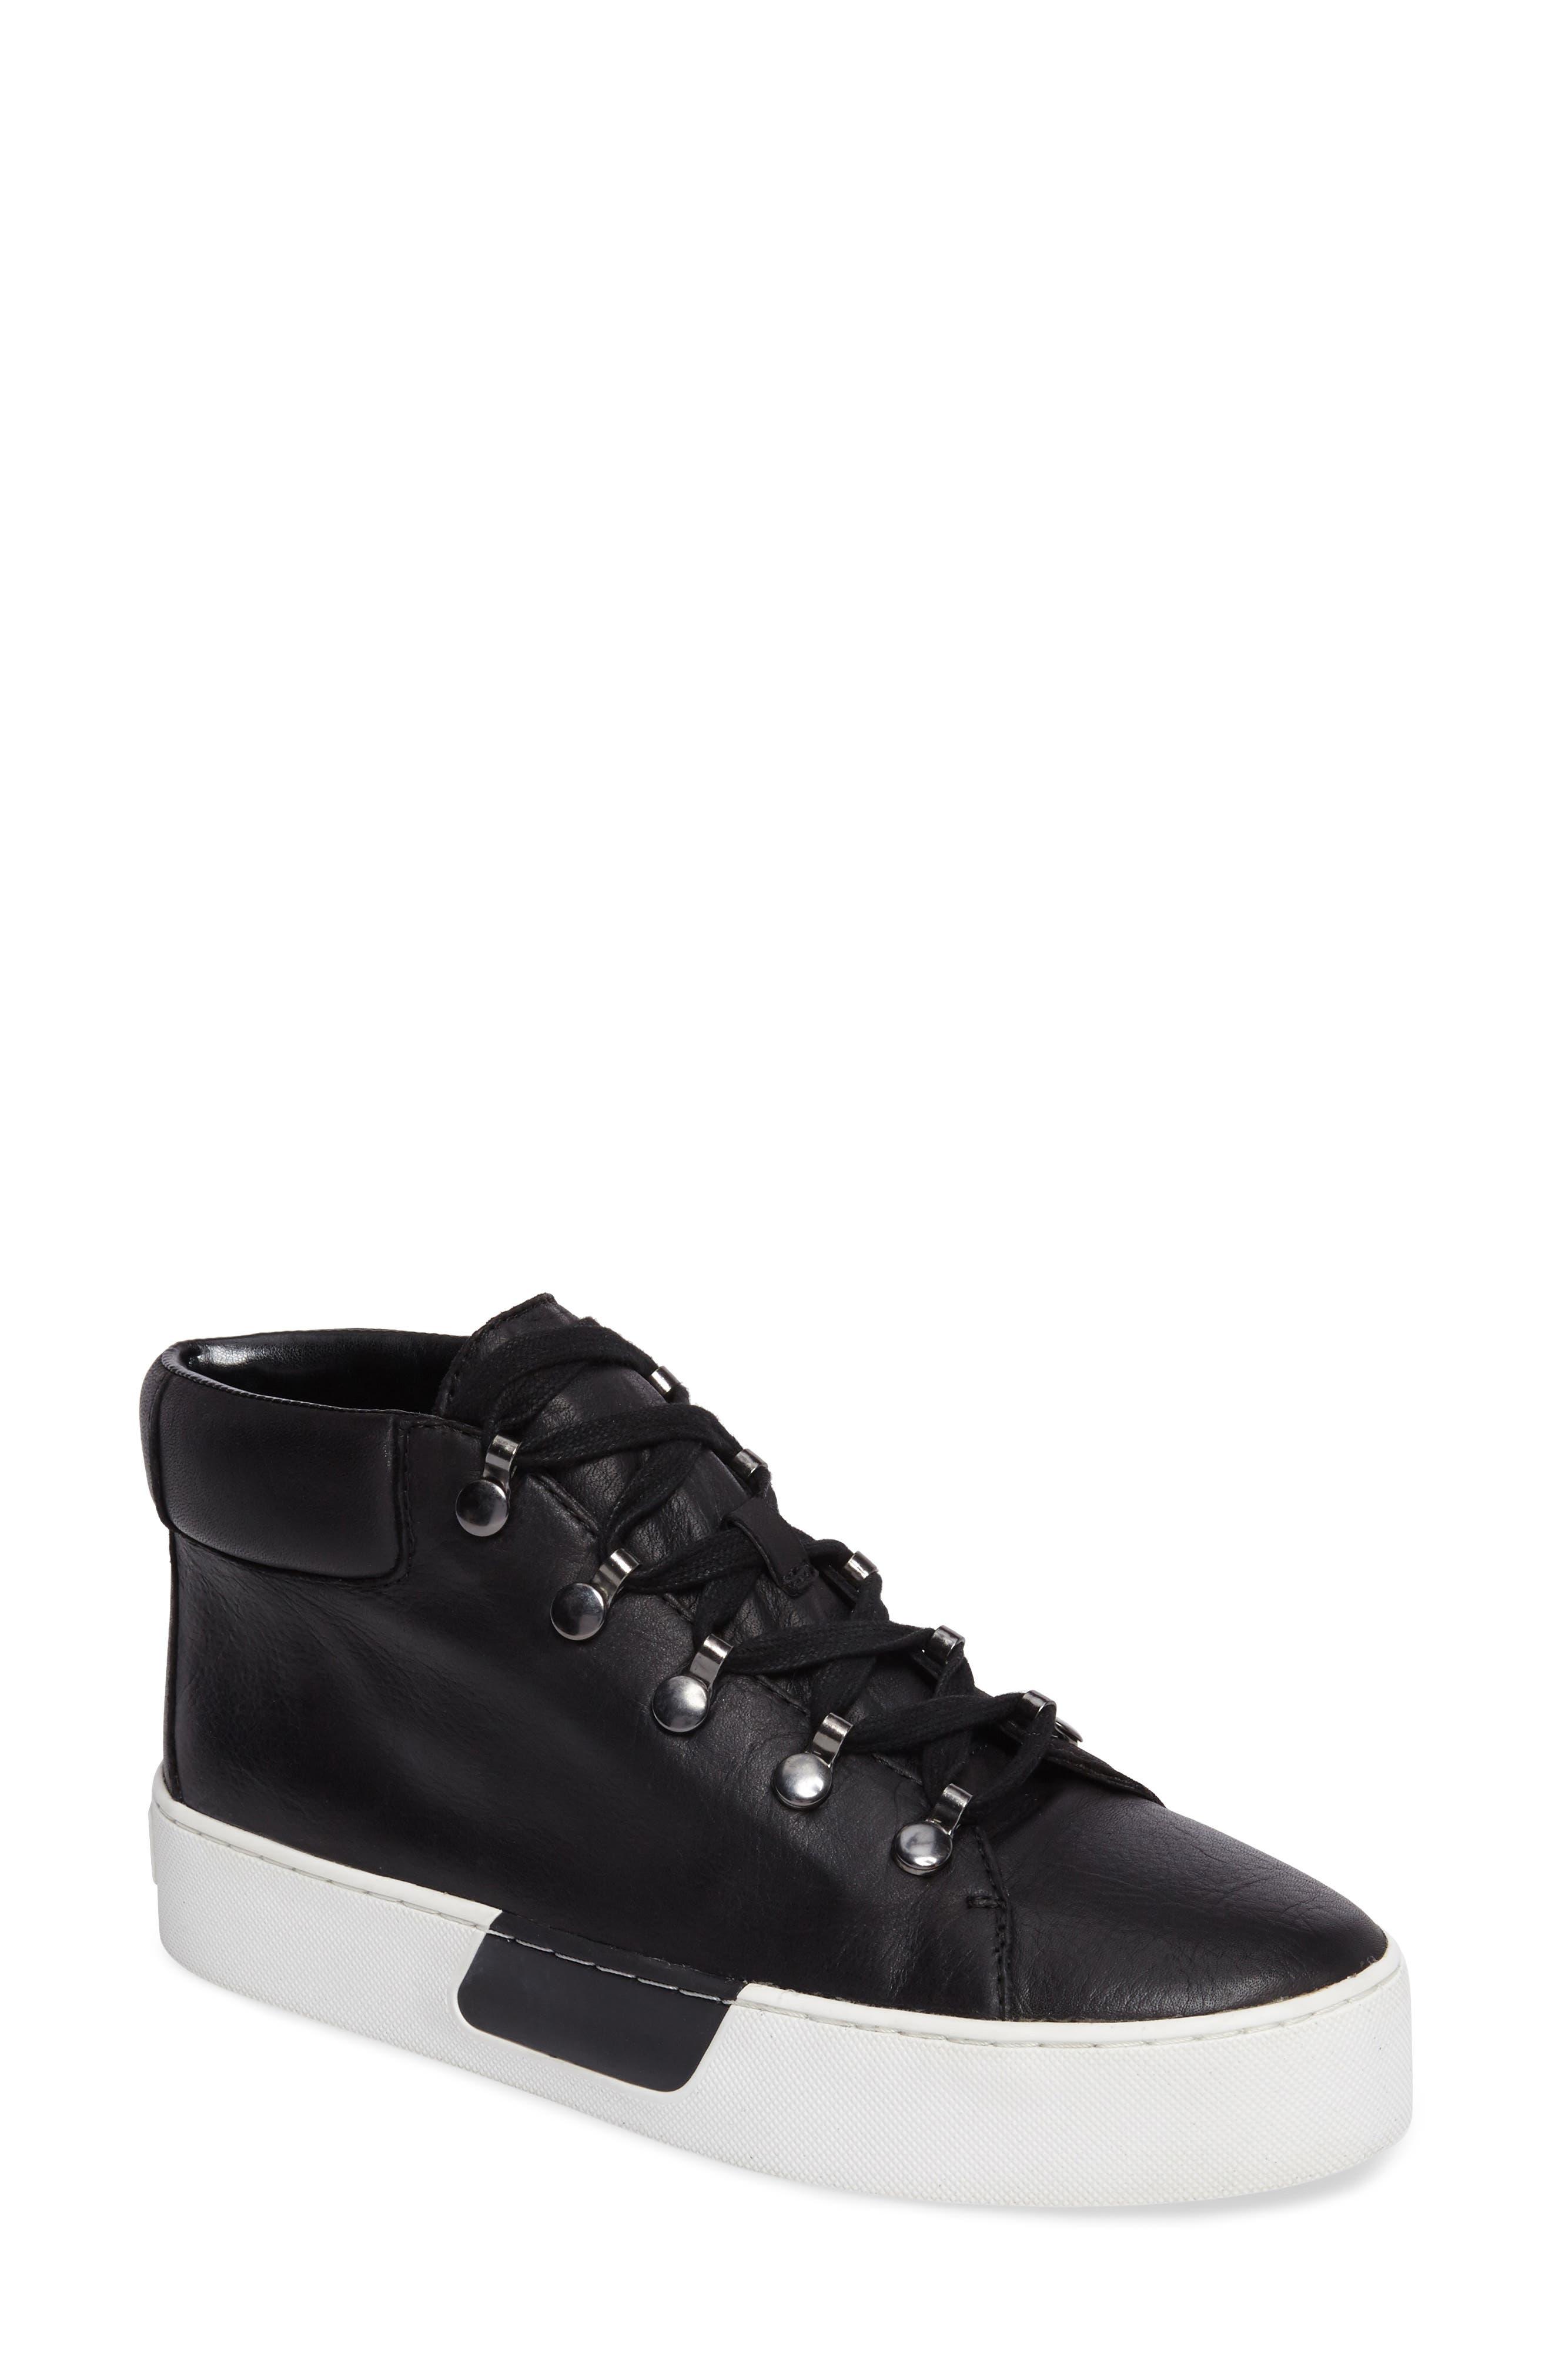 Wrine High Top Sneaker,                         Main,                         color, 001